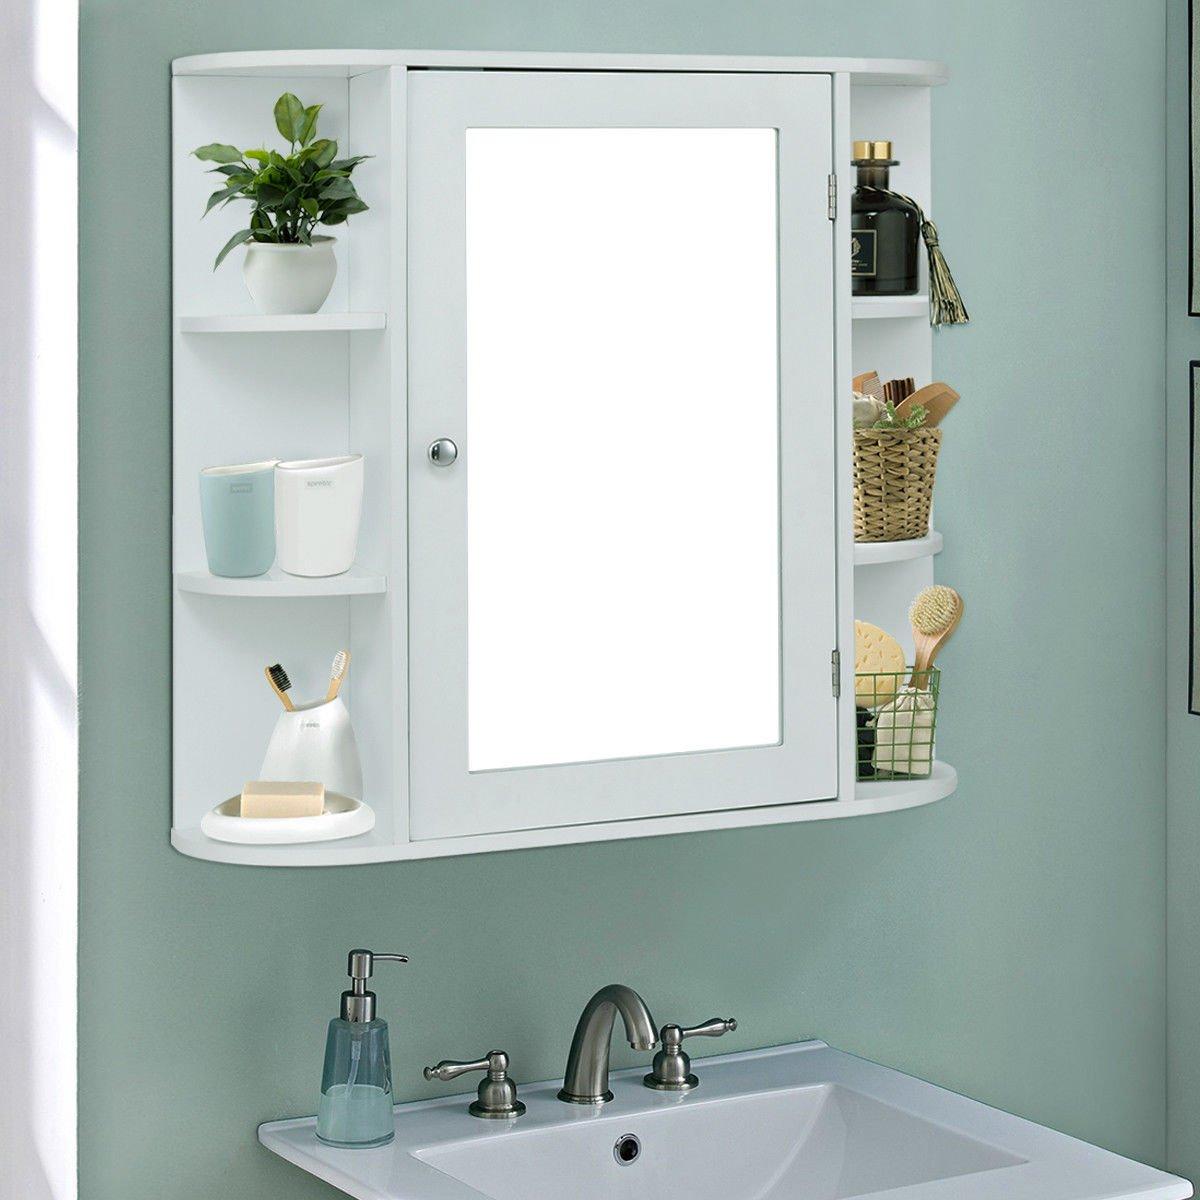 Giantex Wall Mounted Bathroom Storage Cabinet Multipurpose Organizer with Mirror Doors Shelves, White Finish